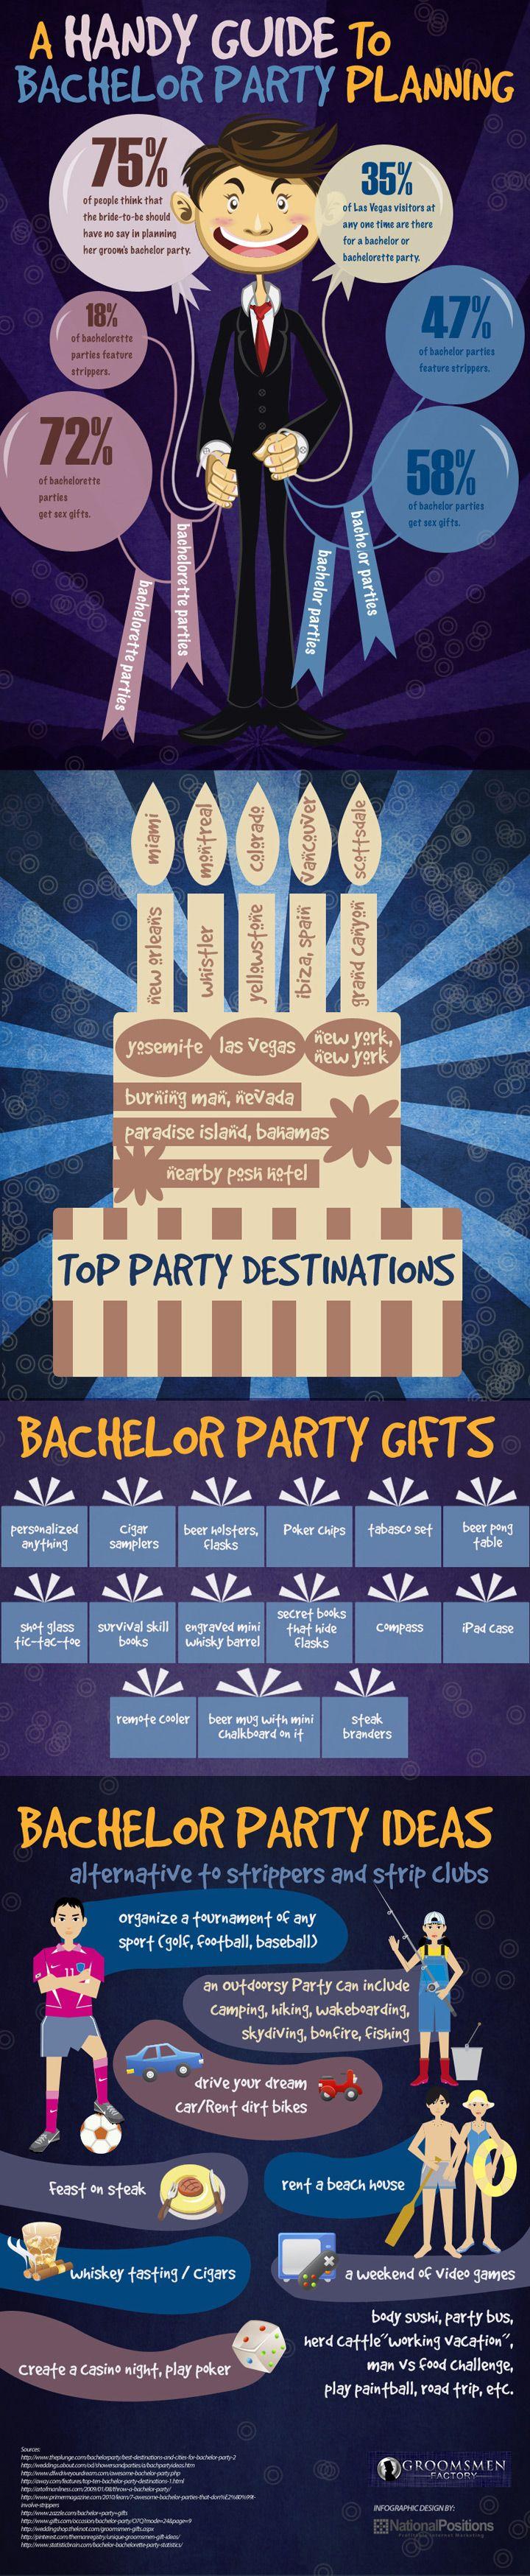 Bachelor Party Planning Bachelor Party Bachelor Party Planning Bachelorette Bachelor Party